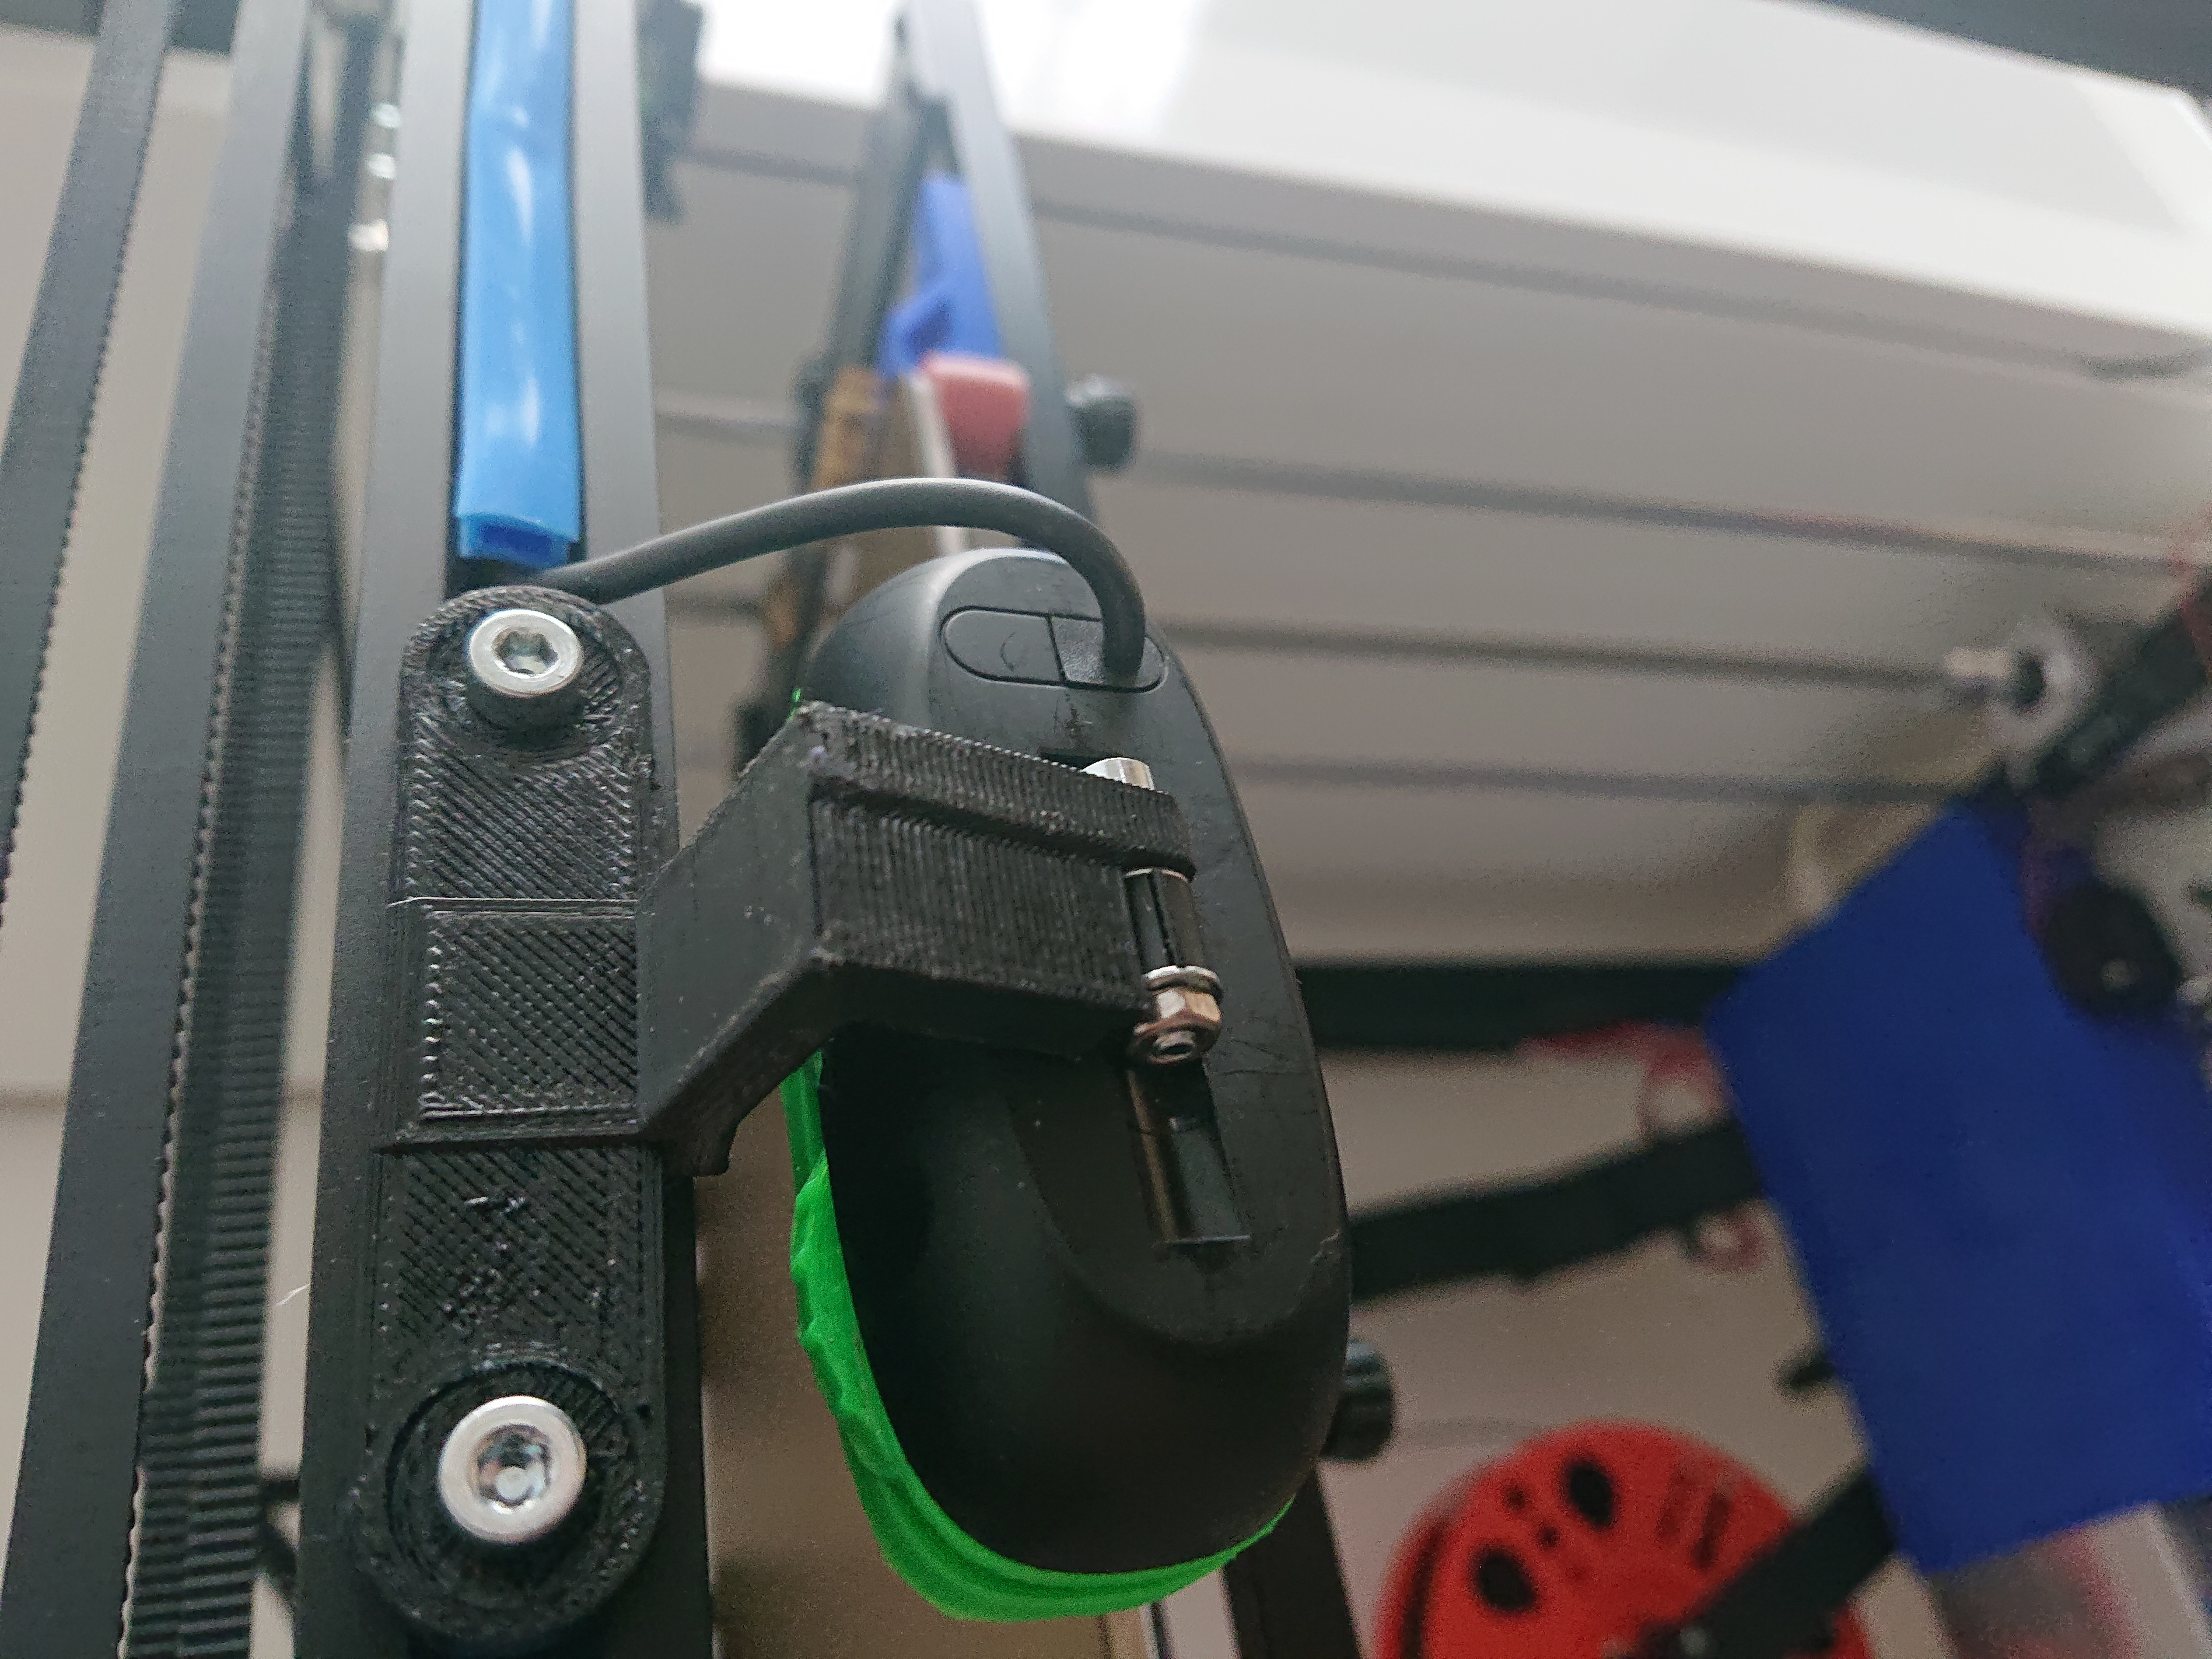 DSC_0585.JPG Download free STL file TronXY X5S Logitech C270 • 3D printer template, Raabi91